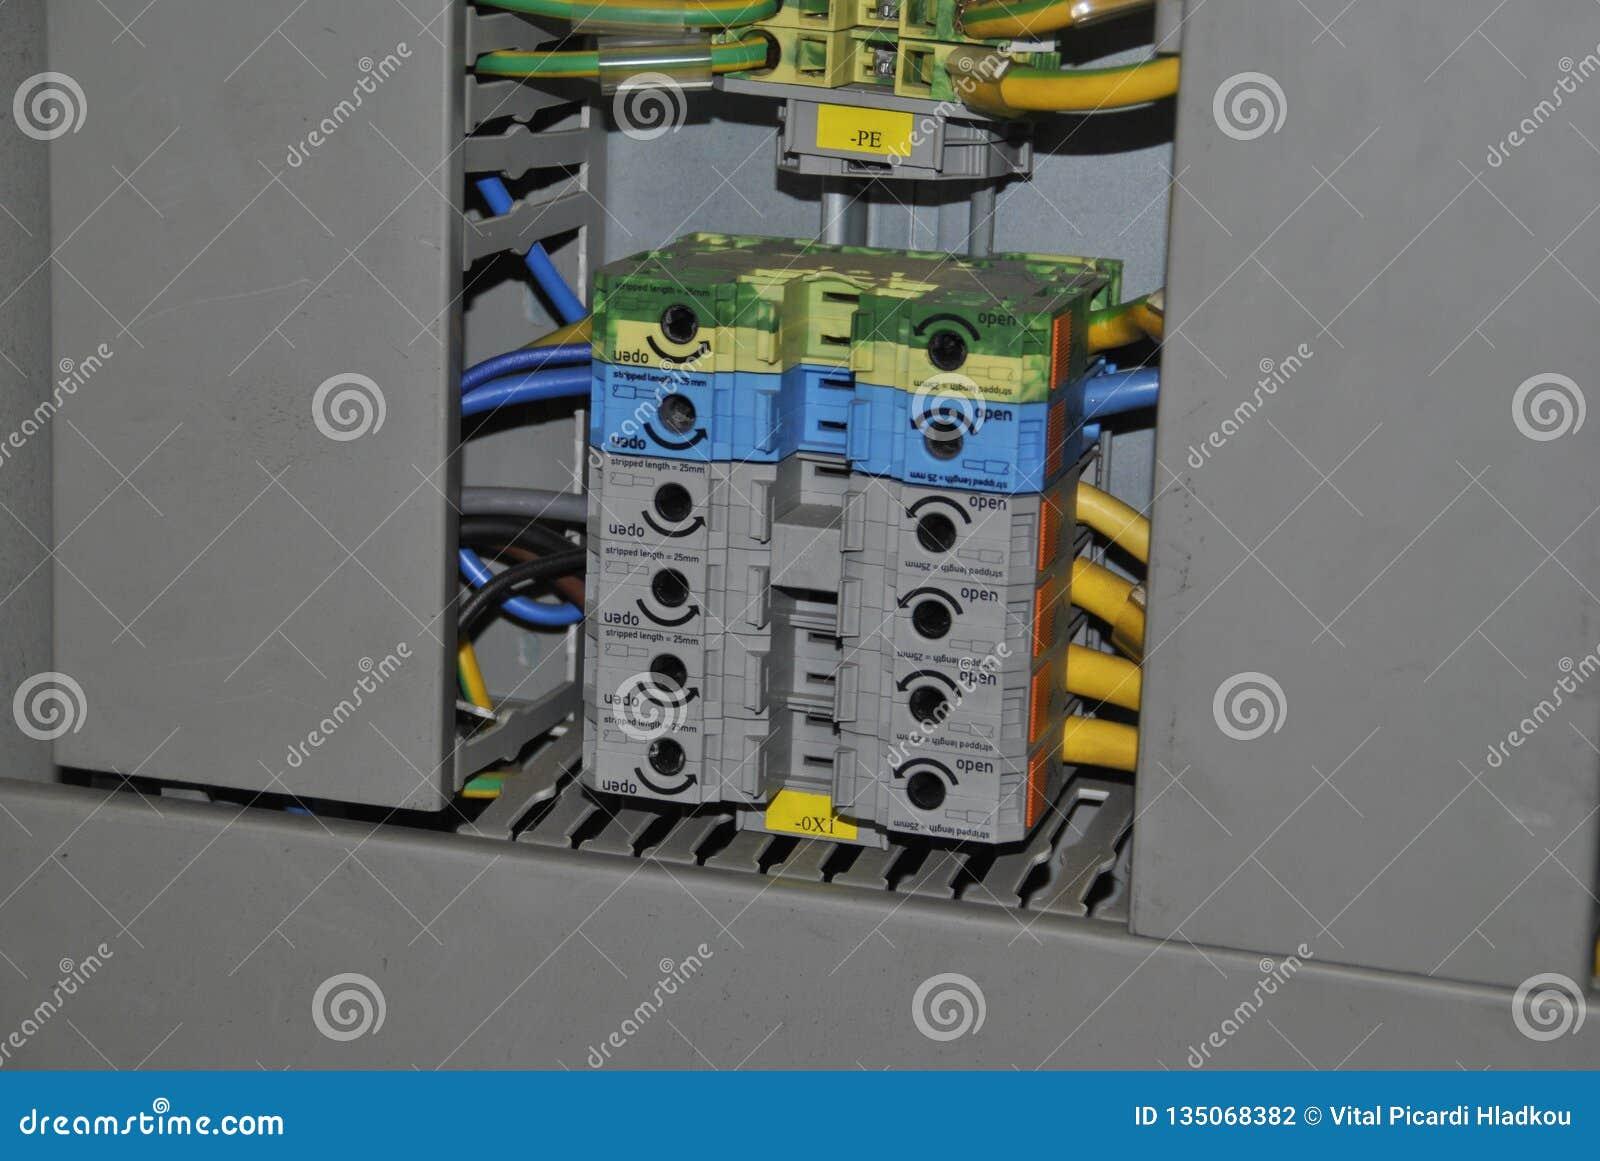 Interruptores no armário elétrico